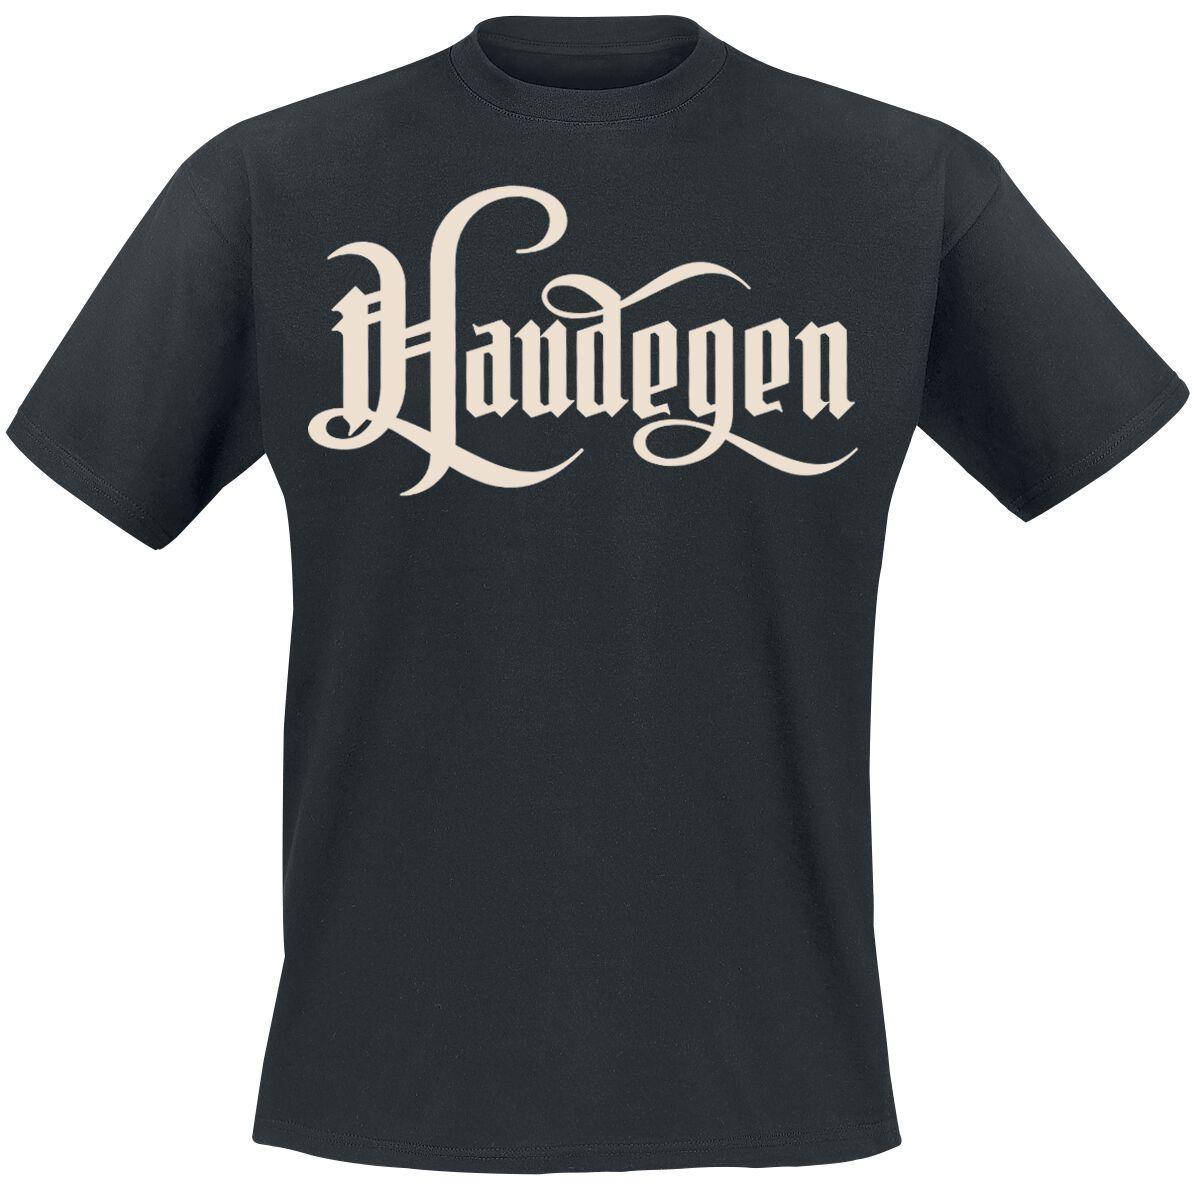 Zespoły - Koszulki - T-Shirt Haudegen Blut Schweiß und Tränen T-Shirt czarny - 365037